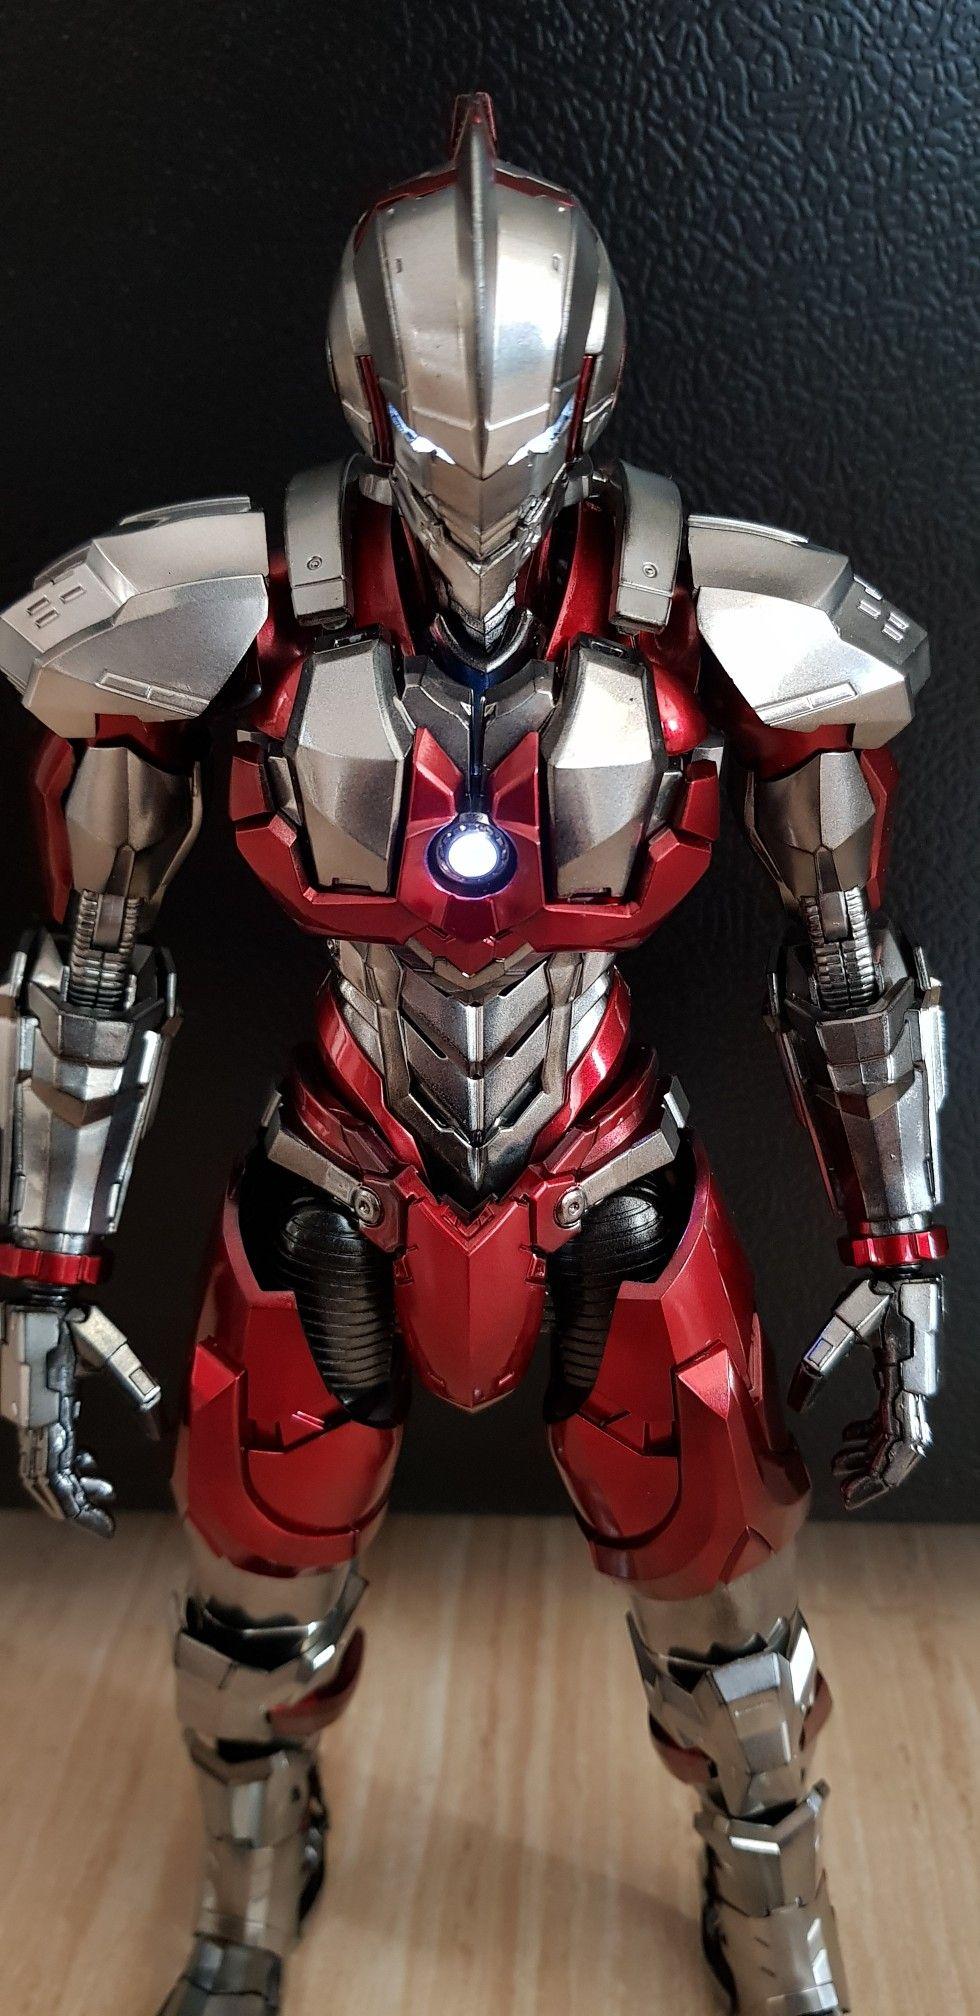 Netflix Ultraman anime Netflix anime, Anime, Anime japan